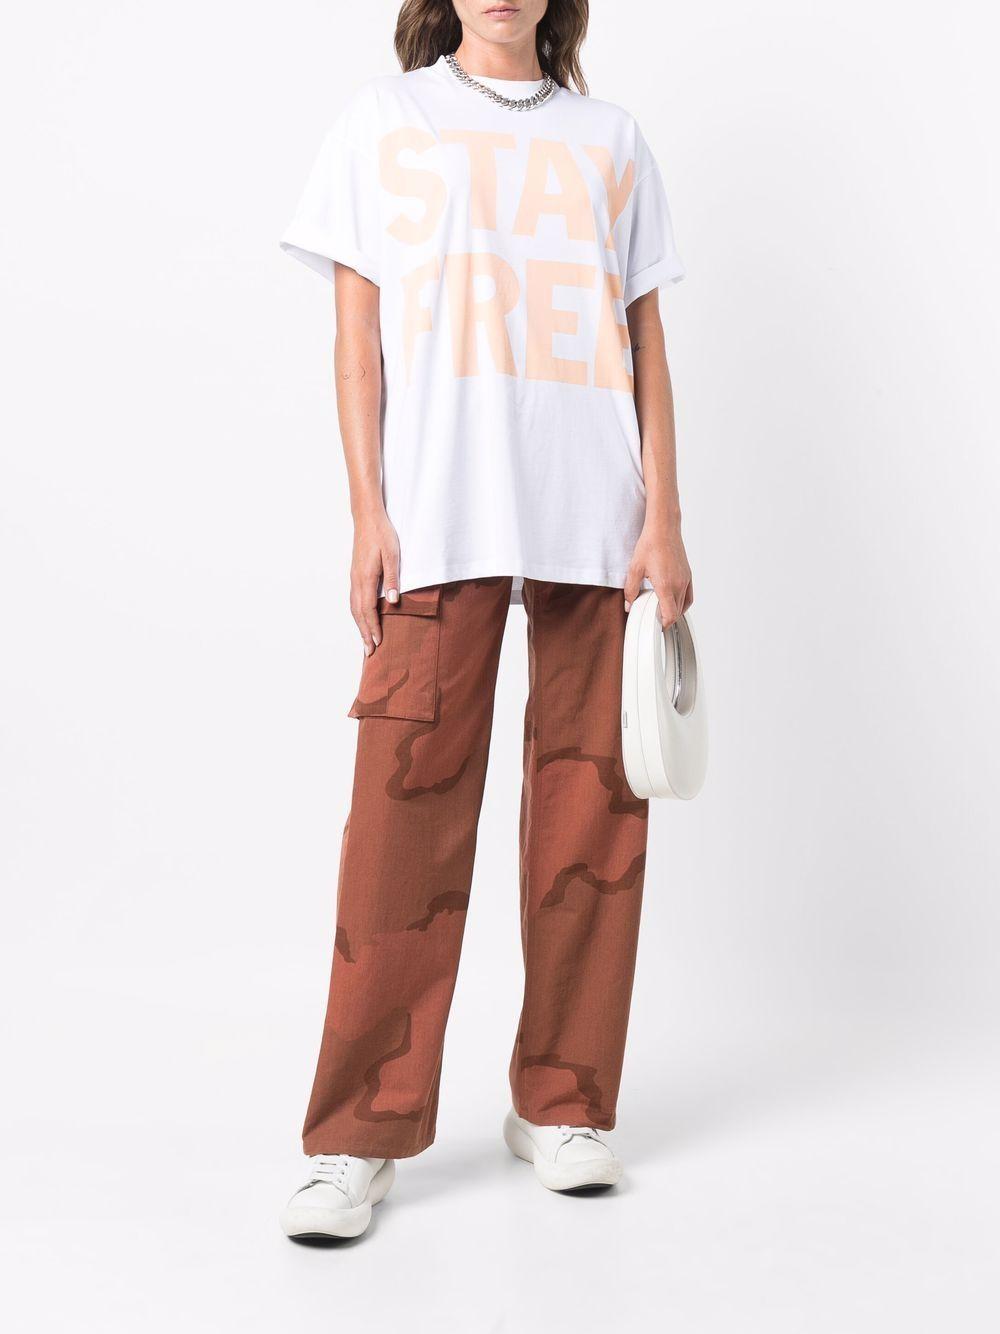 slogan t-shirt unisex white in cotton HONEY FUCKING DIJON | T-shirts | HFD04T0026